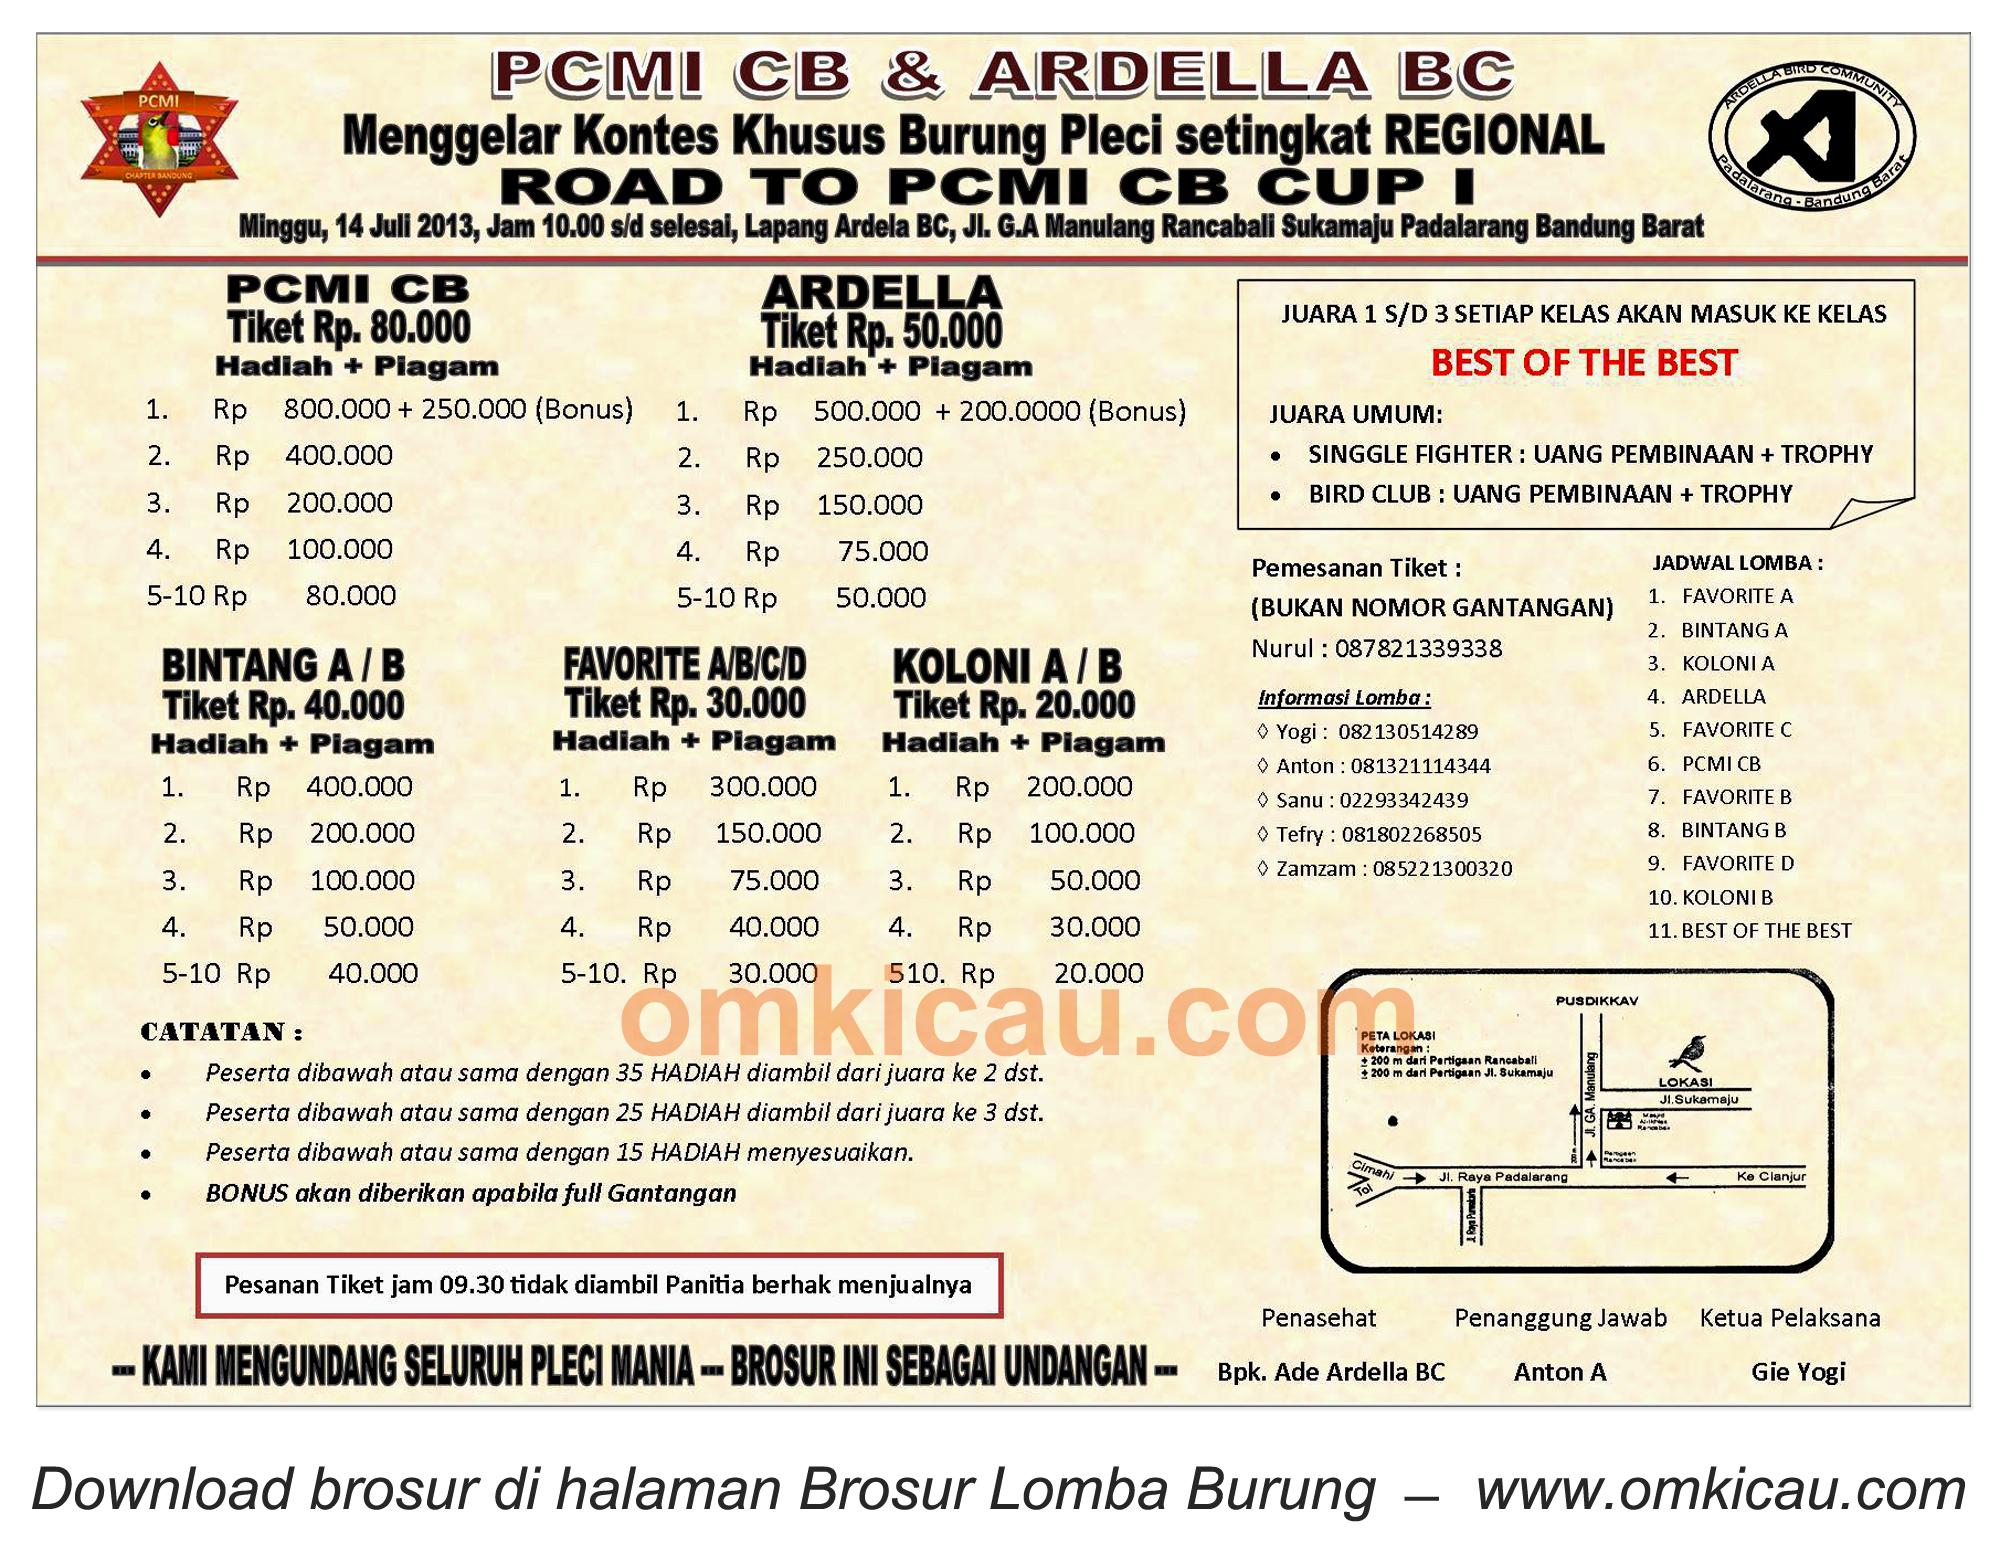 Brosur Kontes Pleci Road to PCMI CB Cup I - Padalarang - 14 Juli 2013